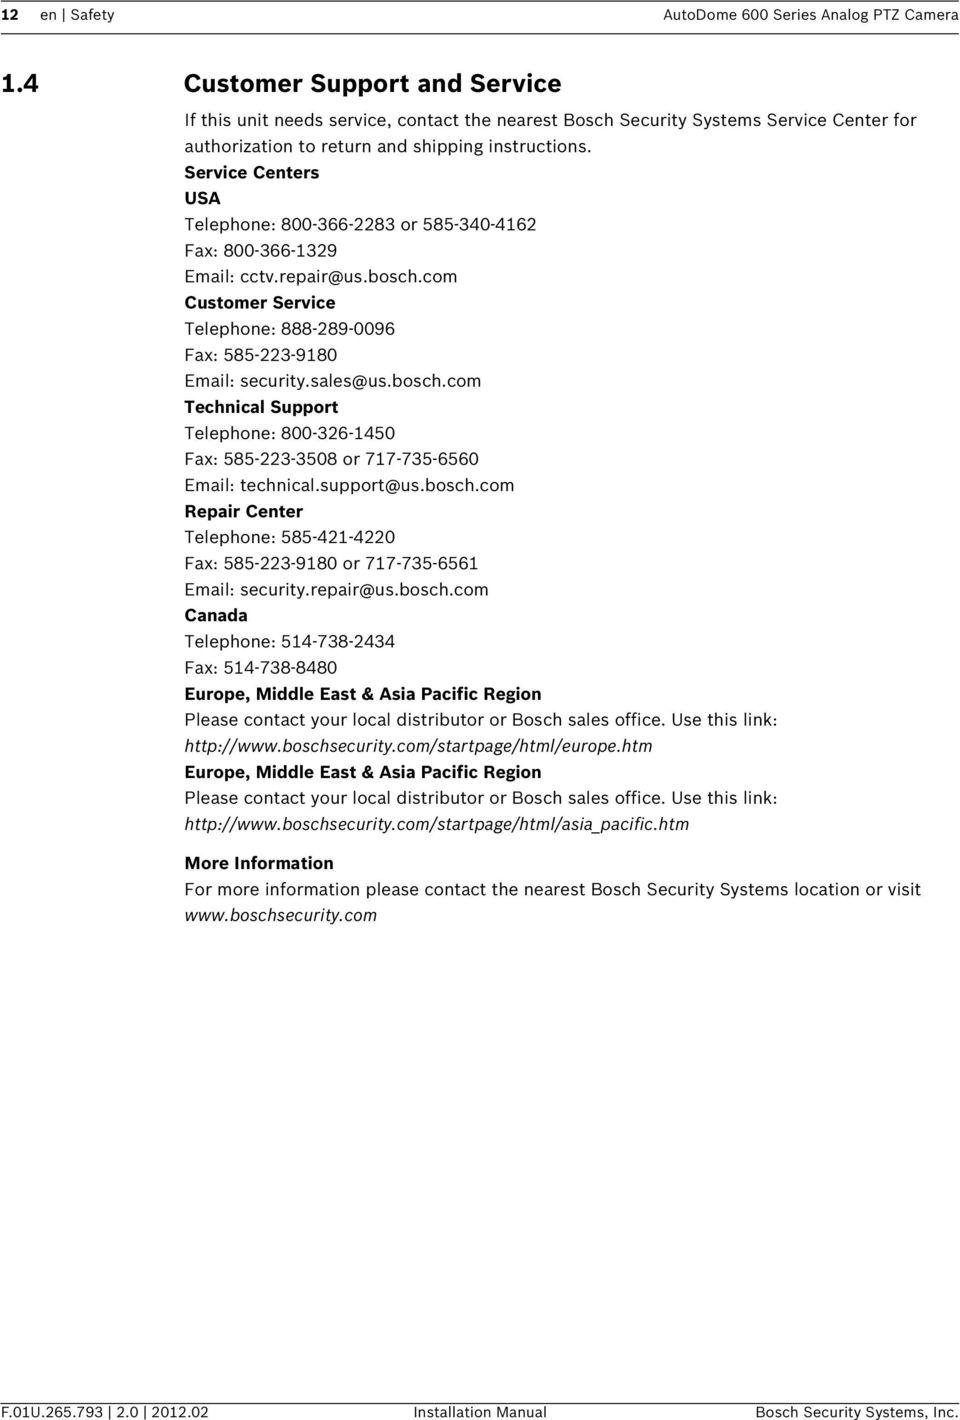 medium resolution of service centers usa telephone 800 366 2283 or 585 340 4162